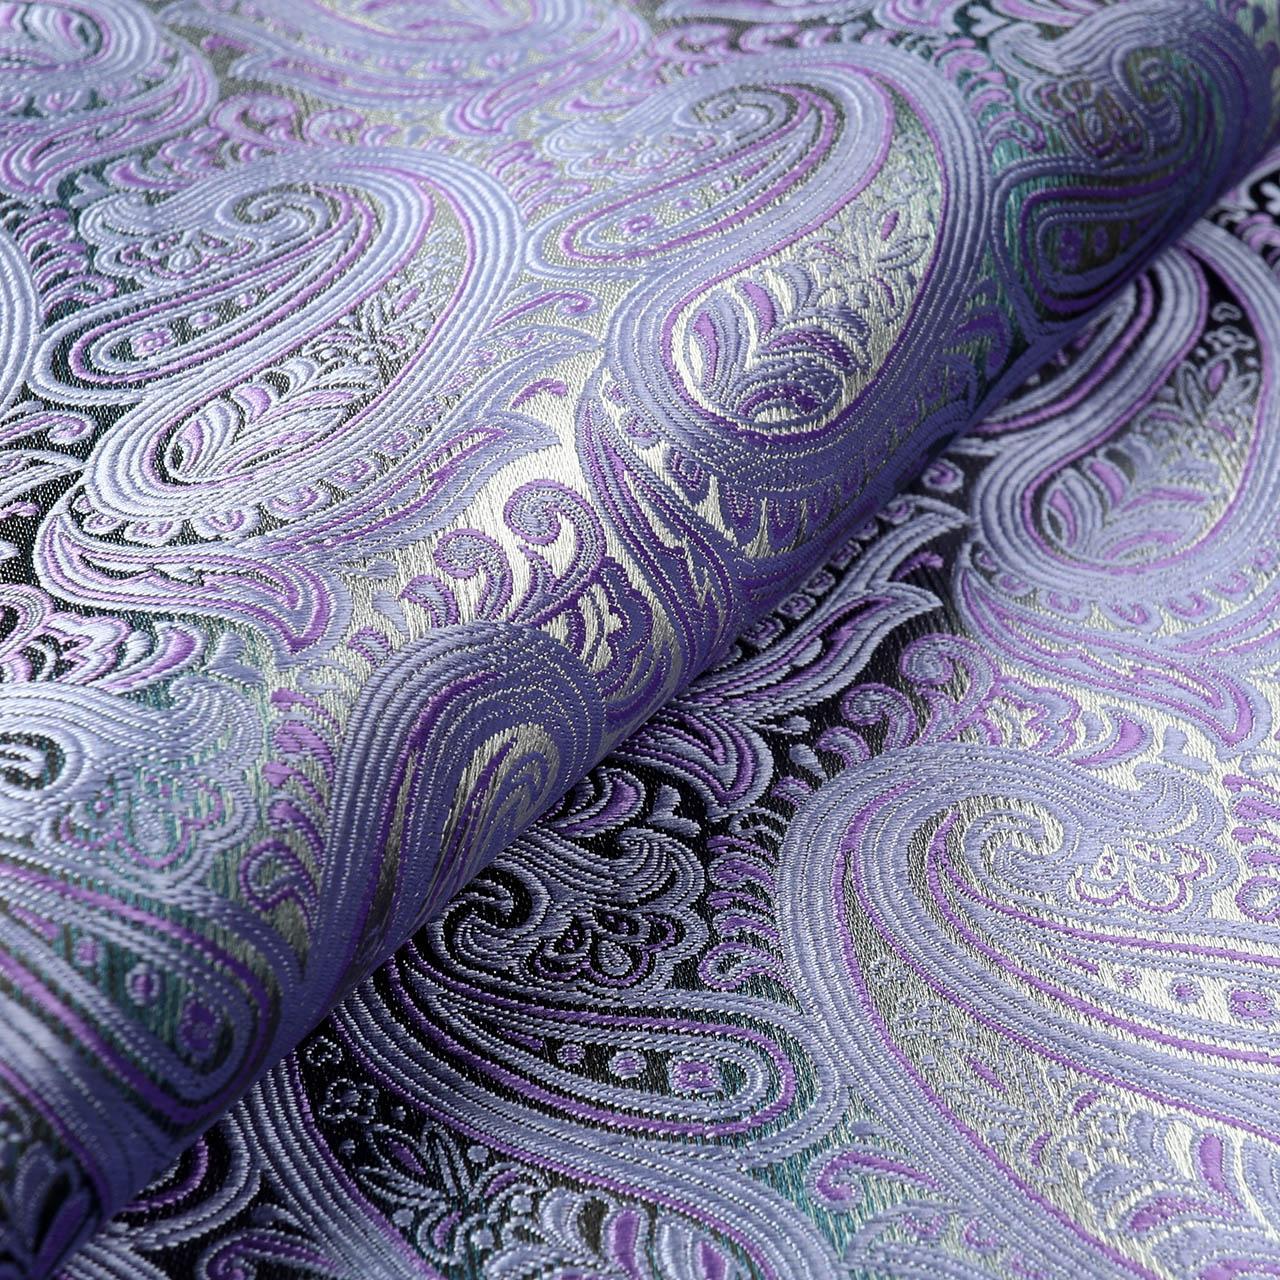 Jacquard Fabric Yarn Dyed Pure Silk Fabric For Wedding Dress 4